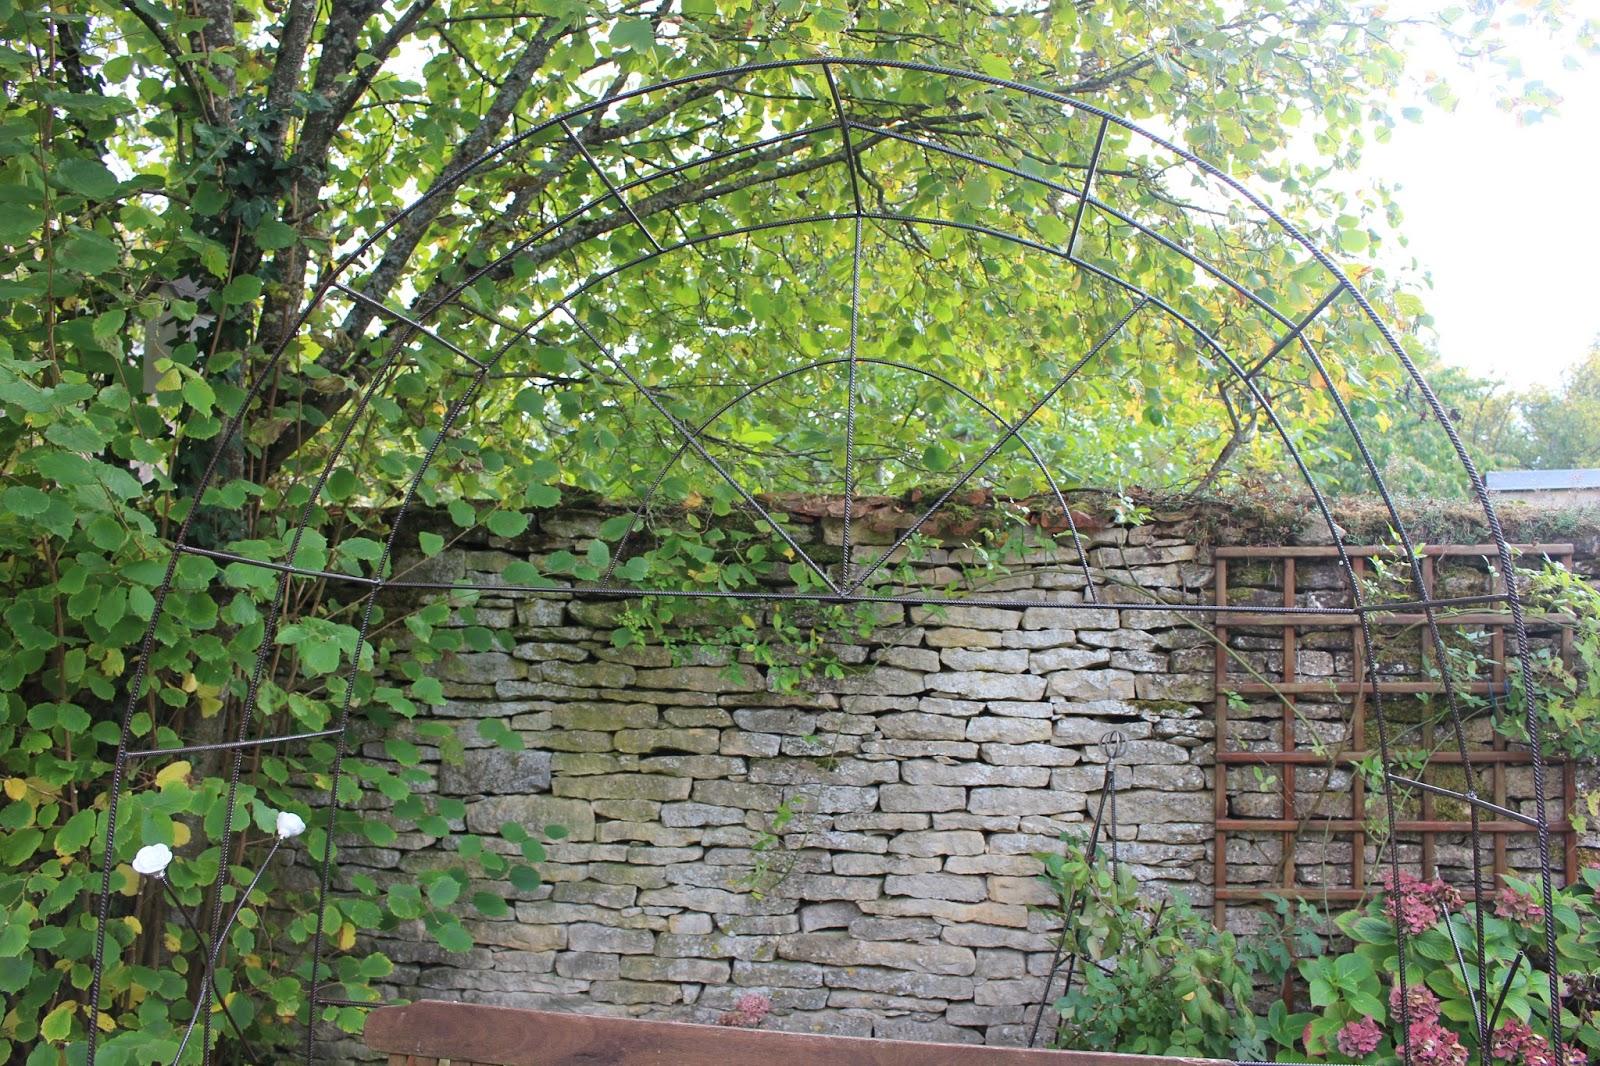 Deco Jardin Fer A Beton >> Notre jardin secret…>> Une arche en fer ? b?ton